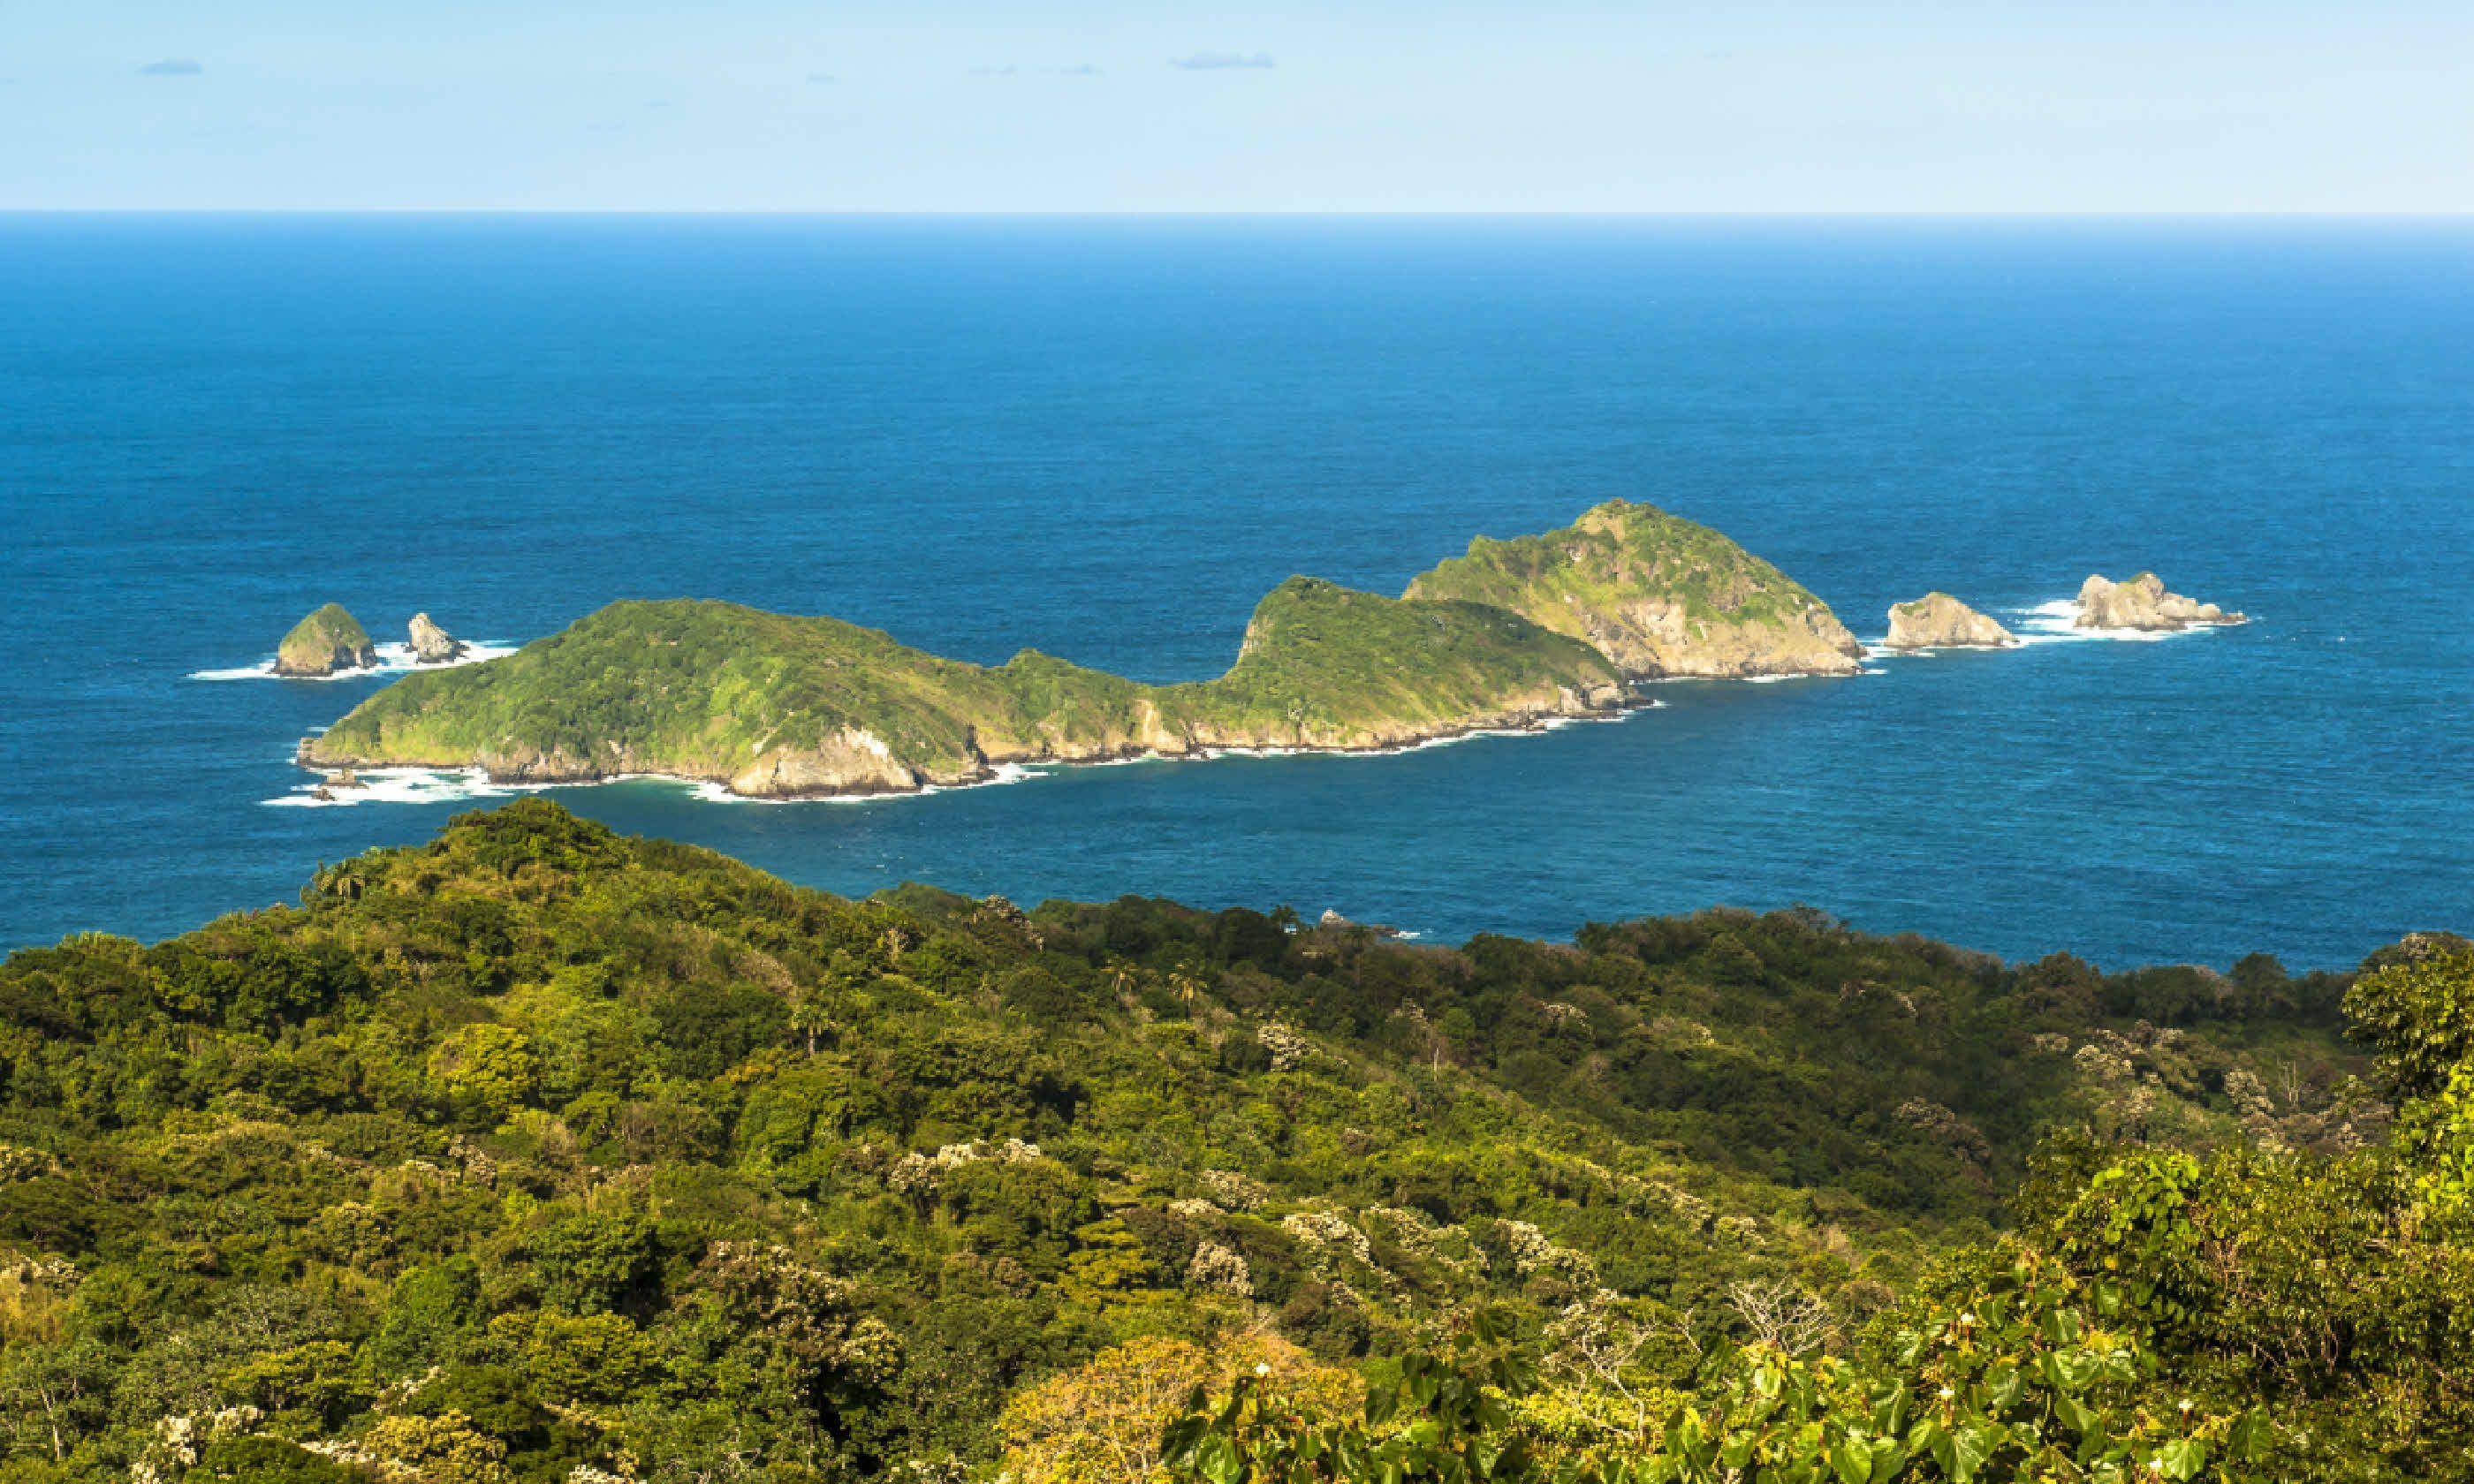 Little Tobago (Shutterstock)